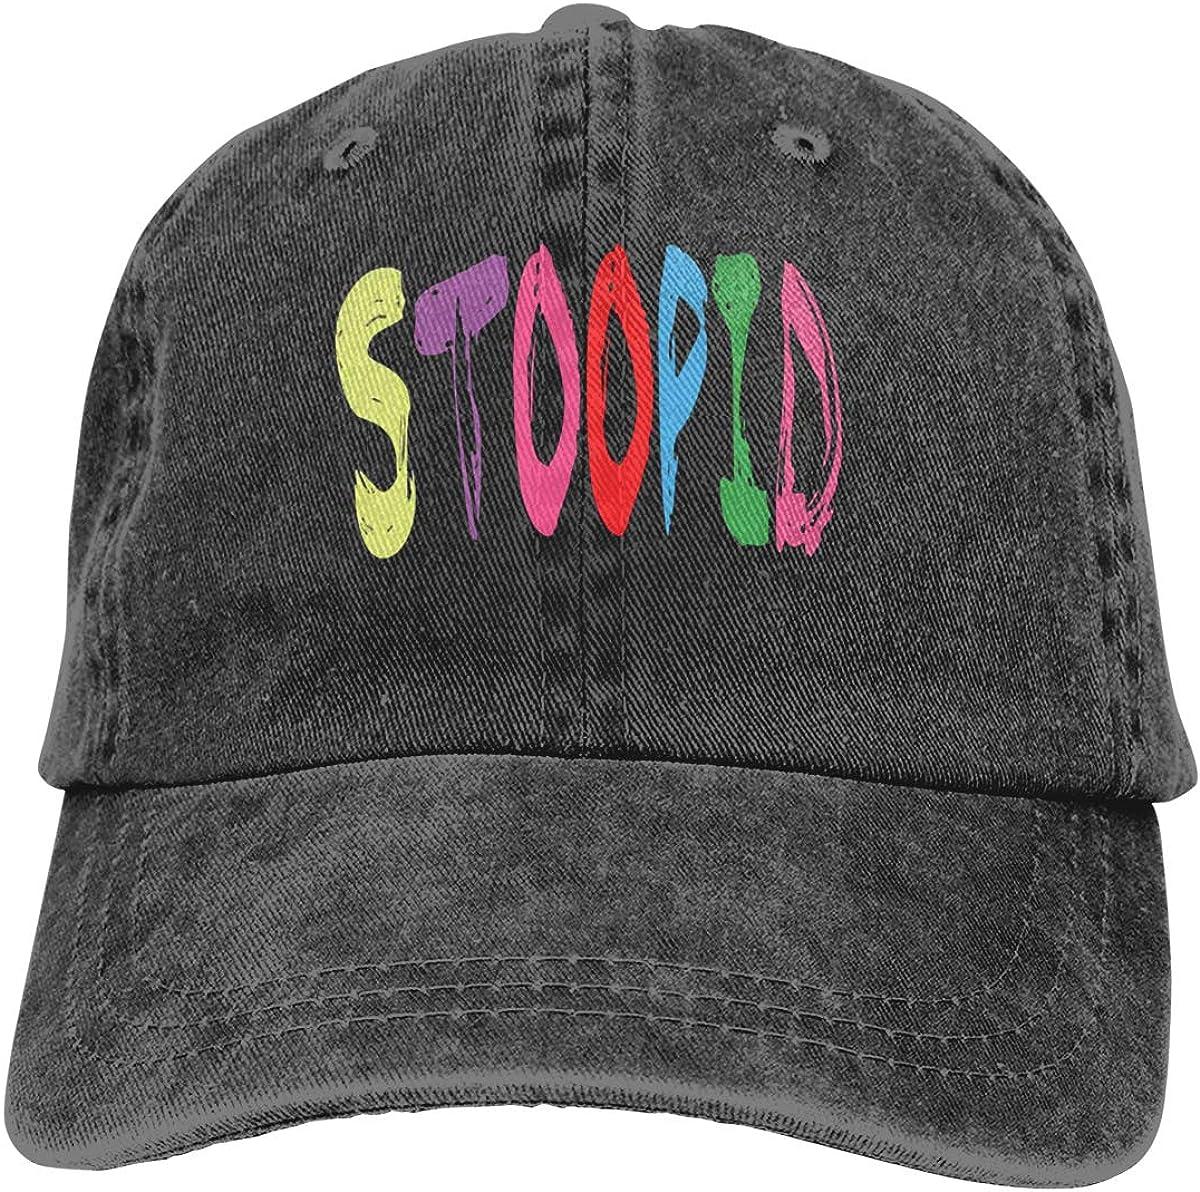 Stoopid Rainbow Adjustable Baseball Hat for Mens Caps